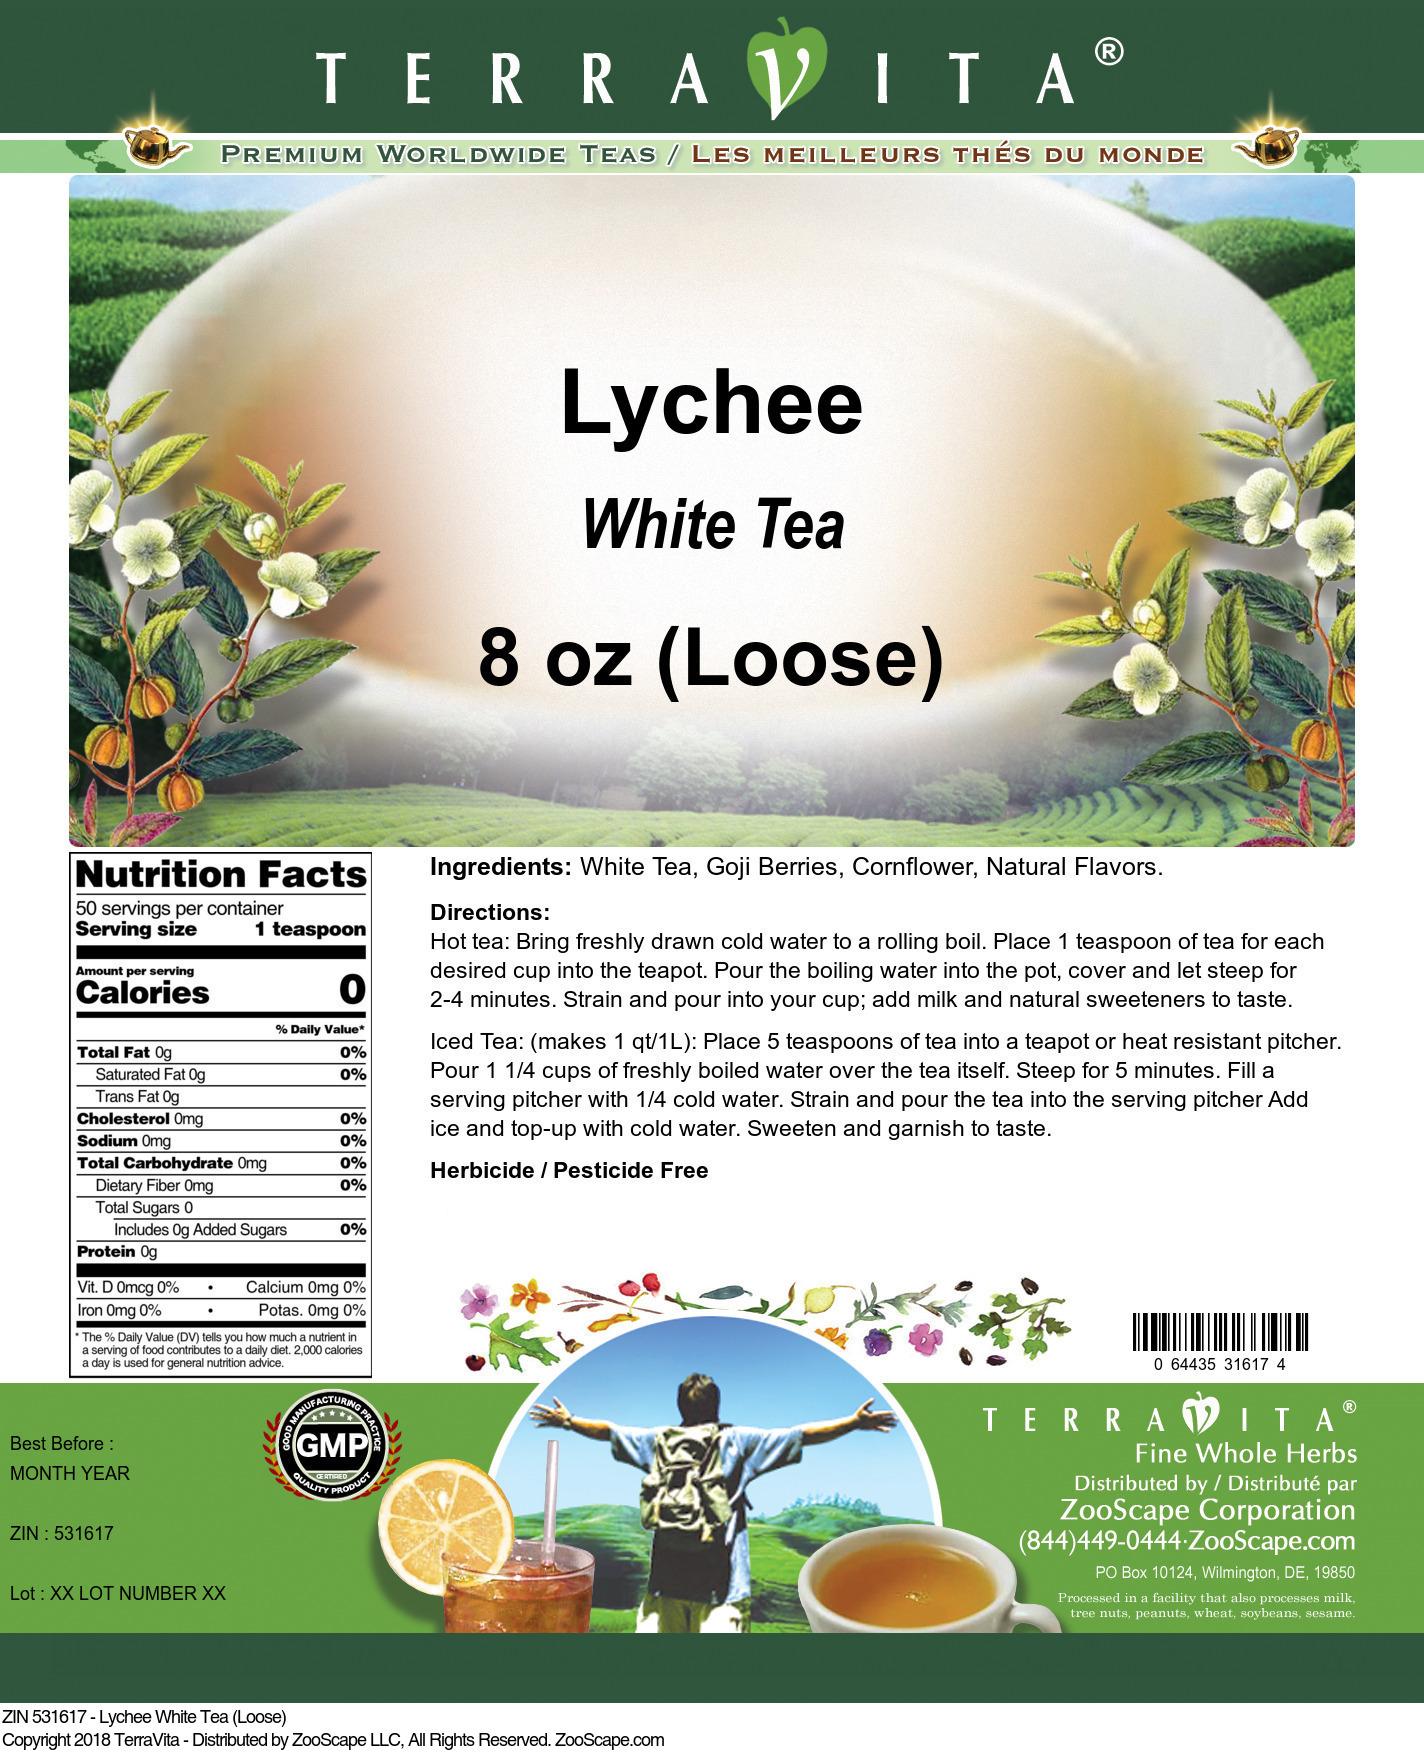 Lychee White Tea